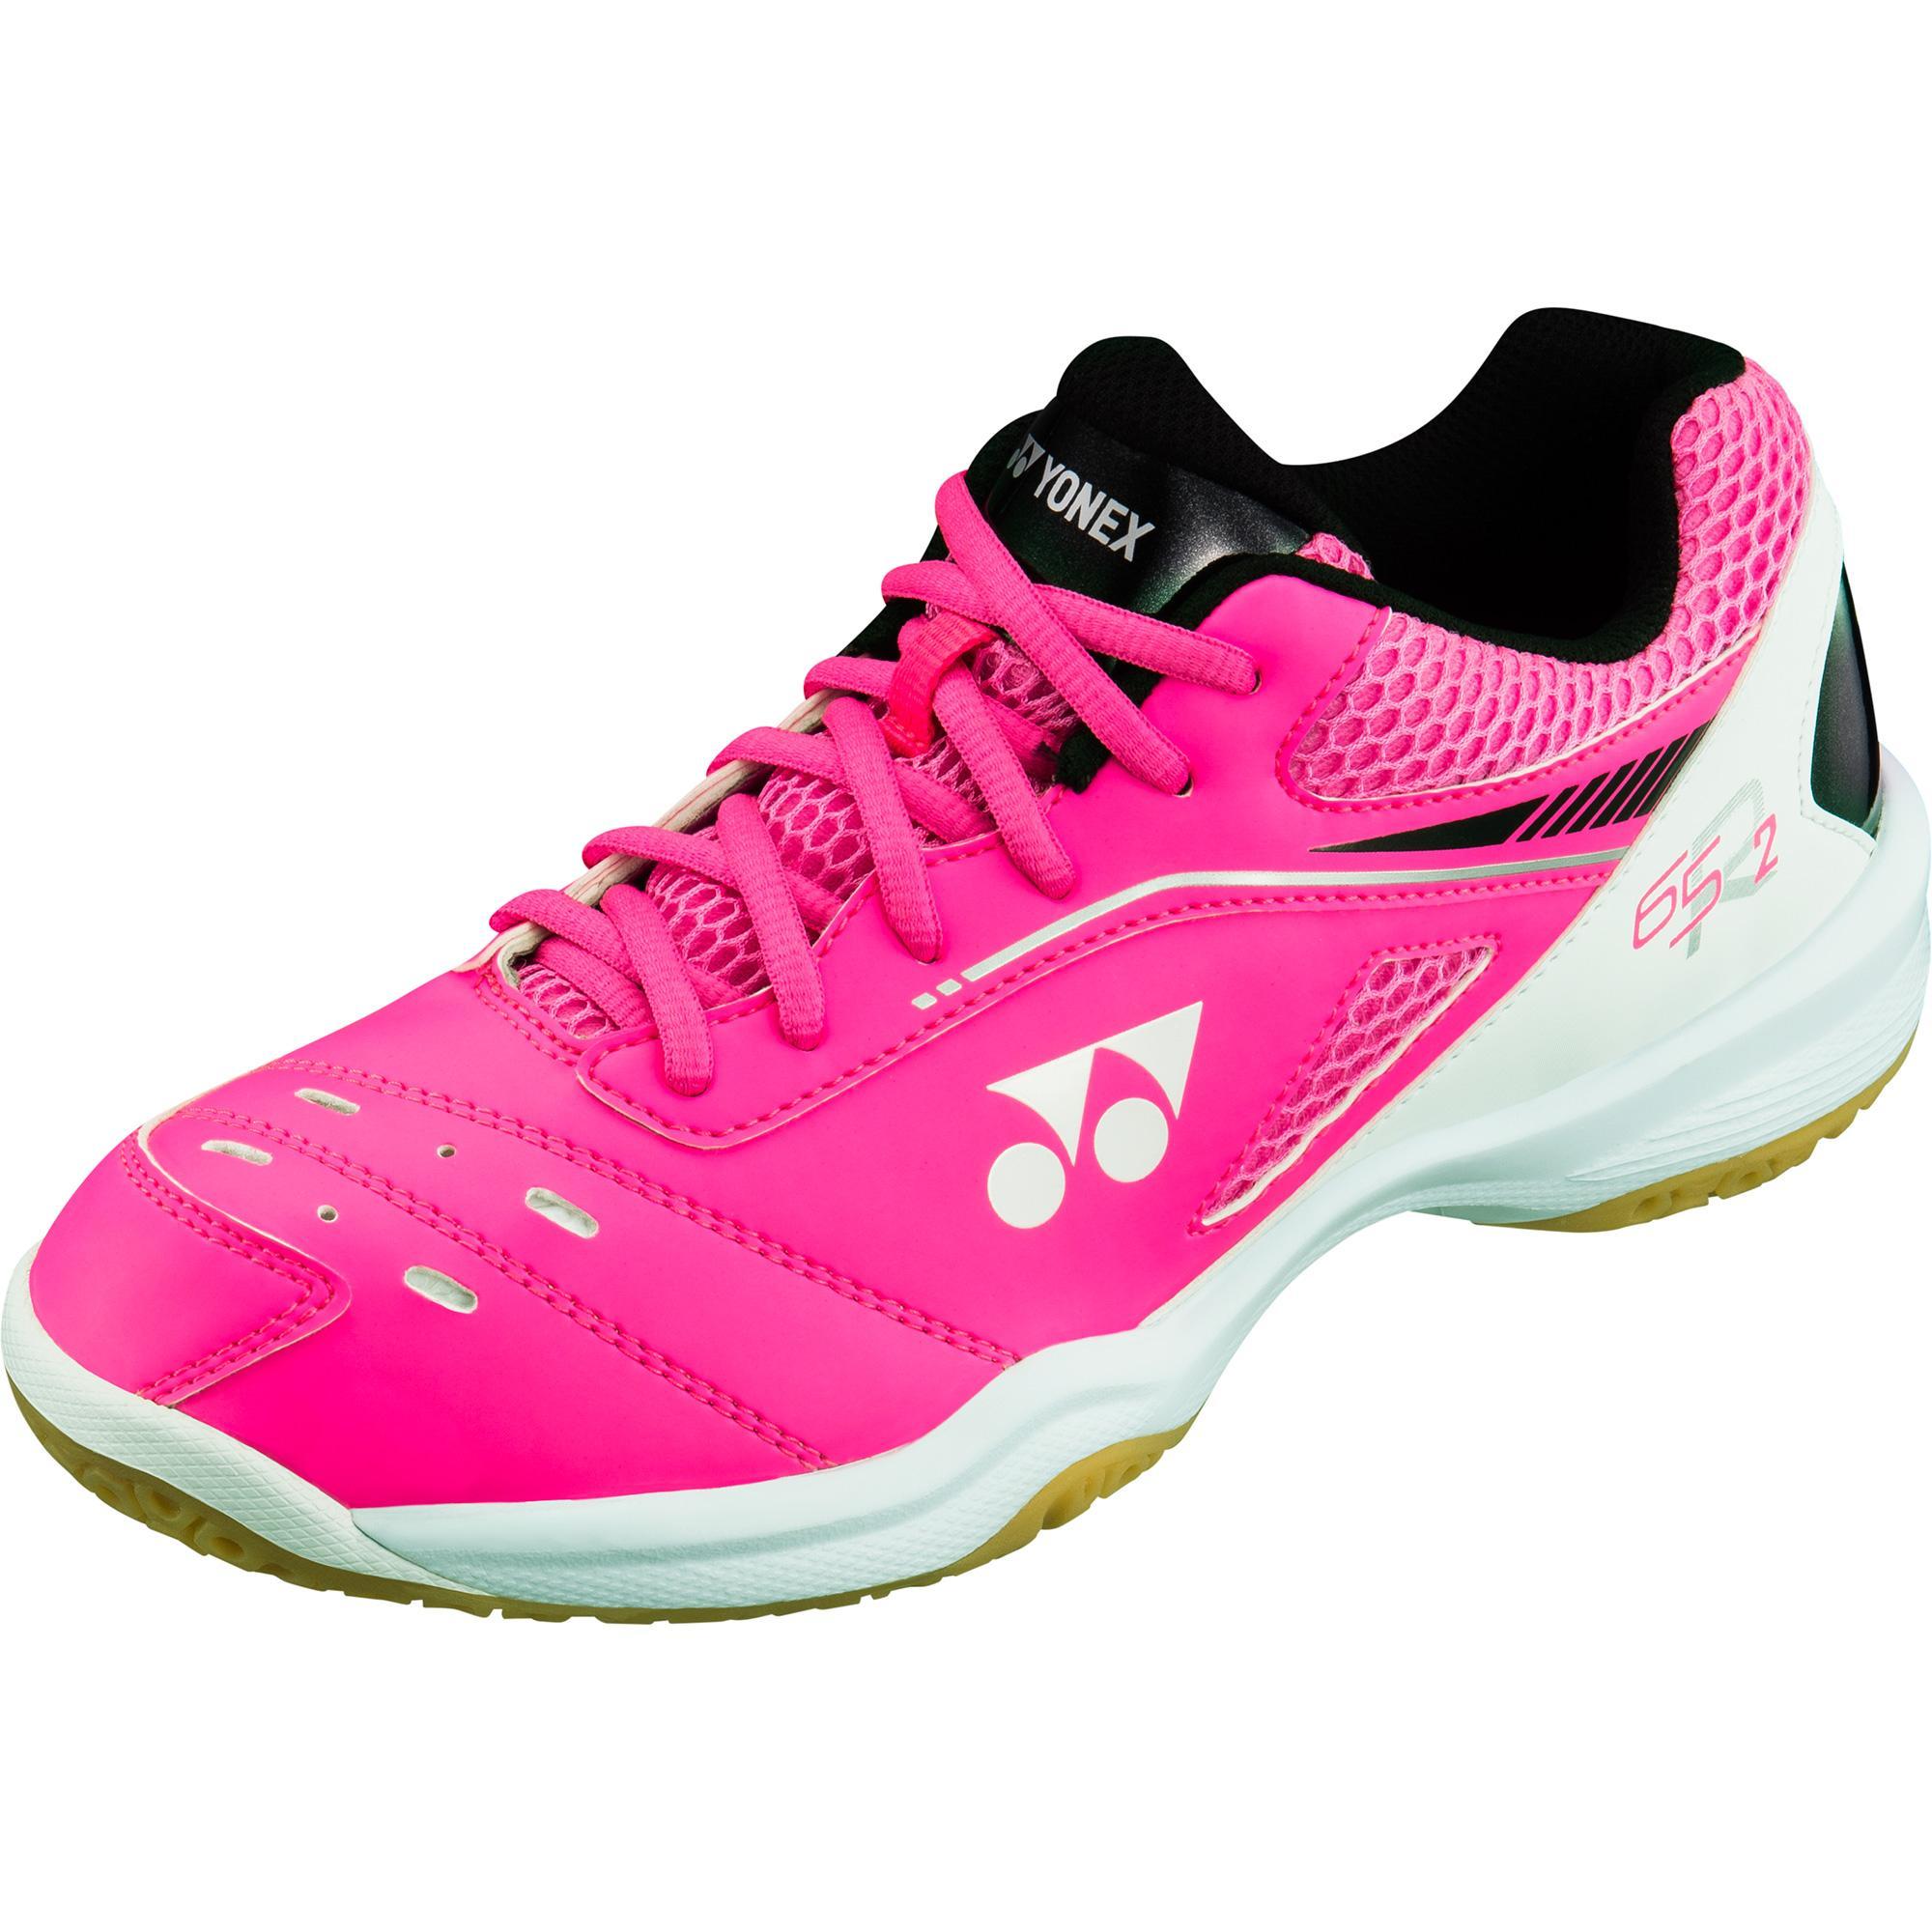 51cfbbefba8a6 Yonex Womens Power Cushion 65 R 2 Badminton Shoes - Pink